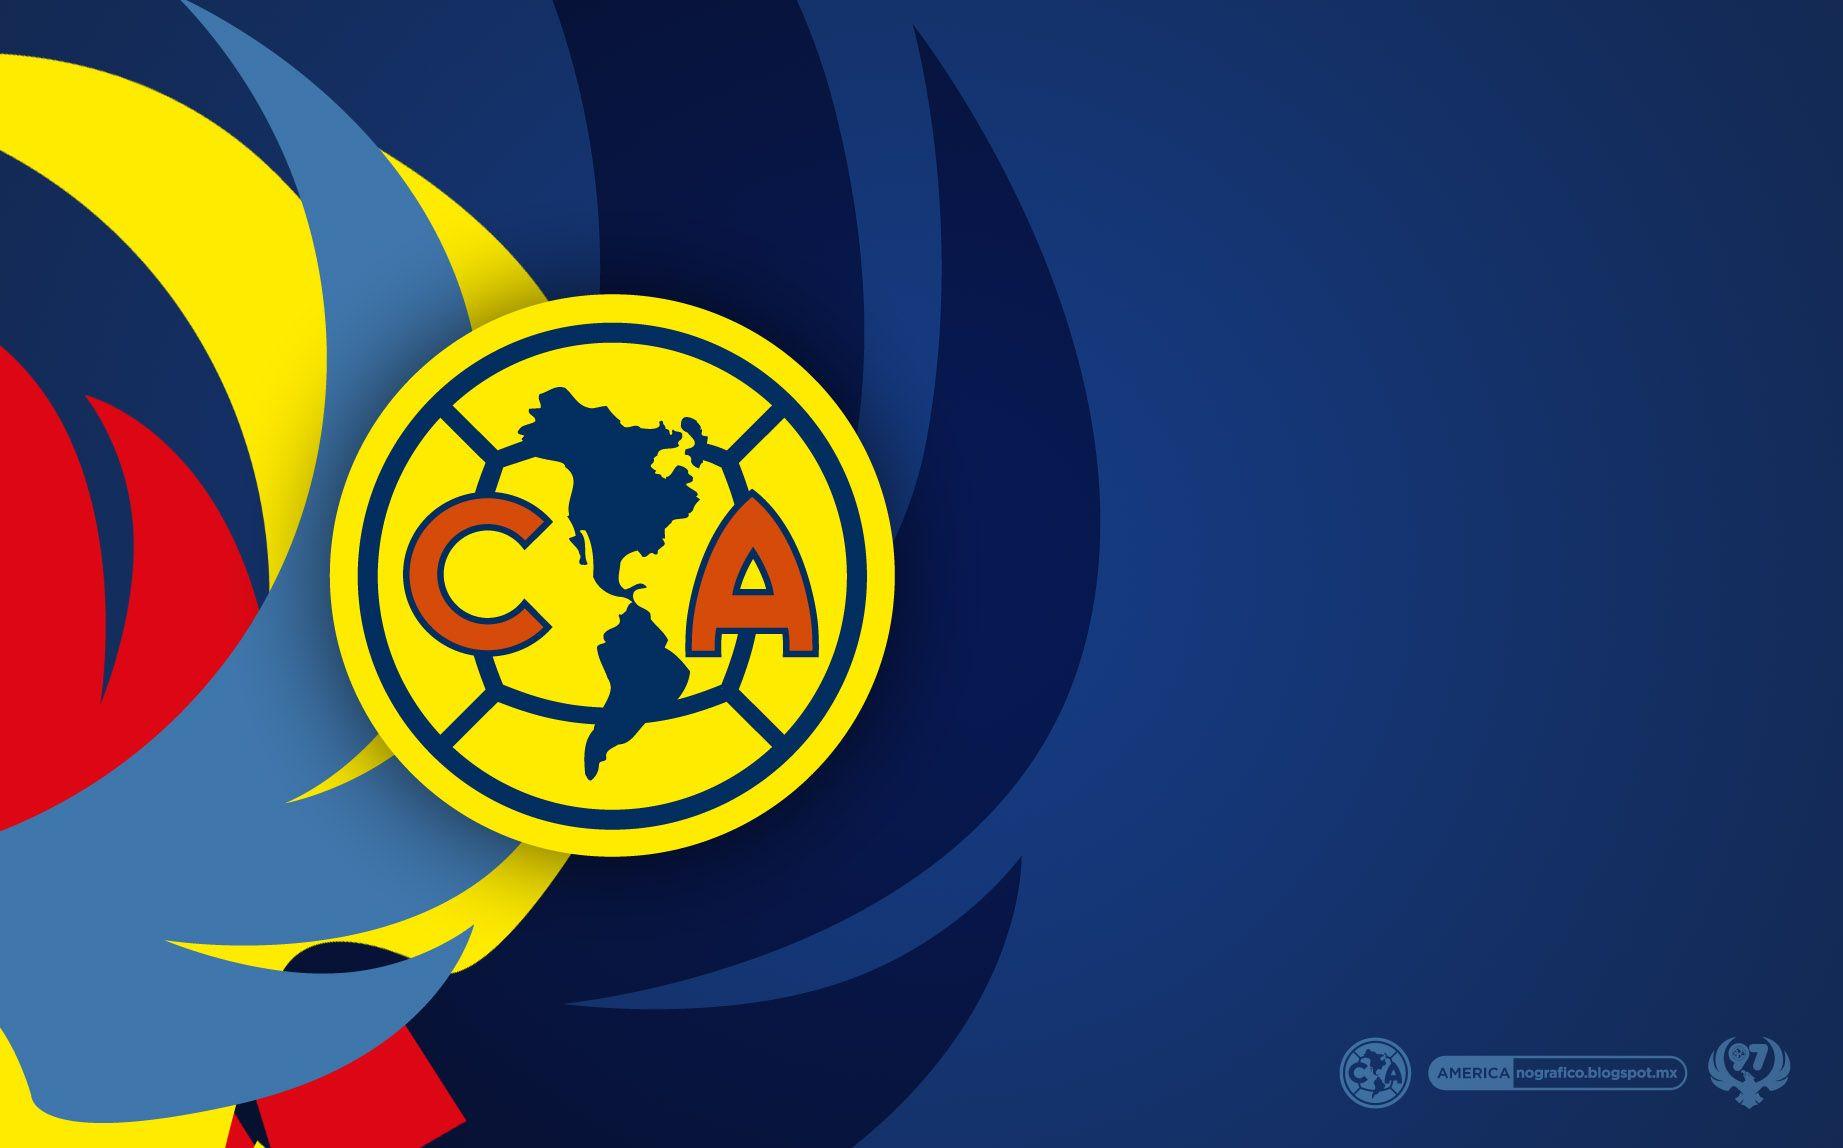 футбол 1 Wallpaper: Club America Wallpapers